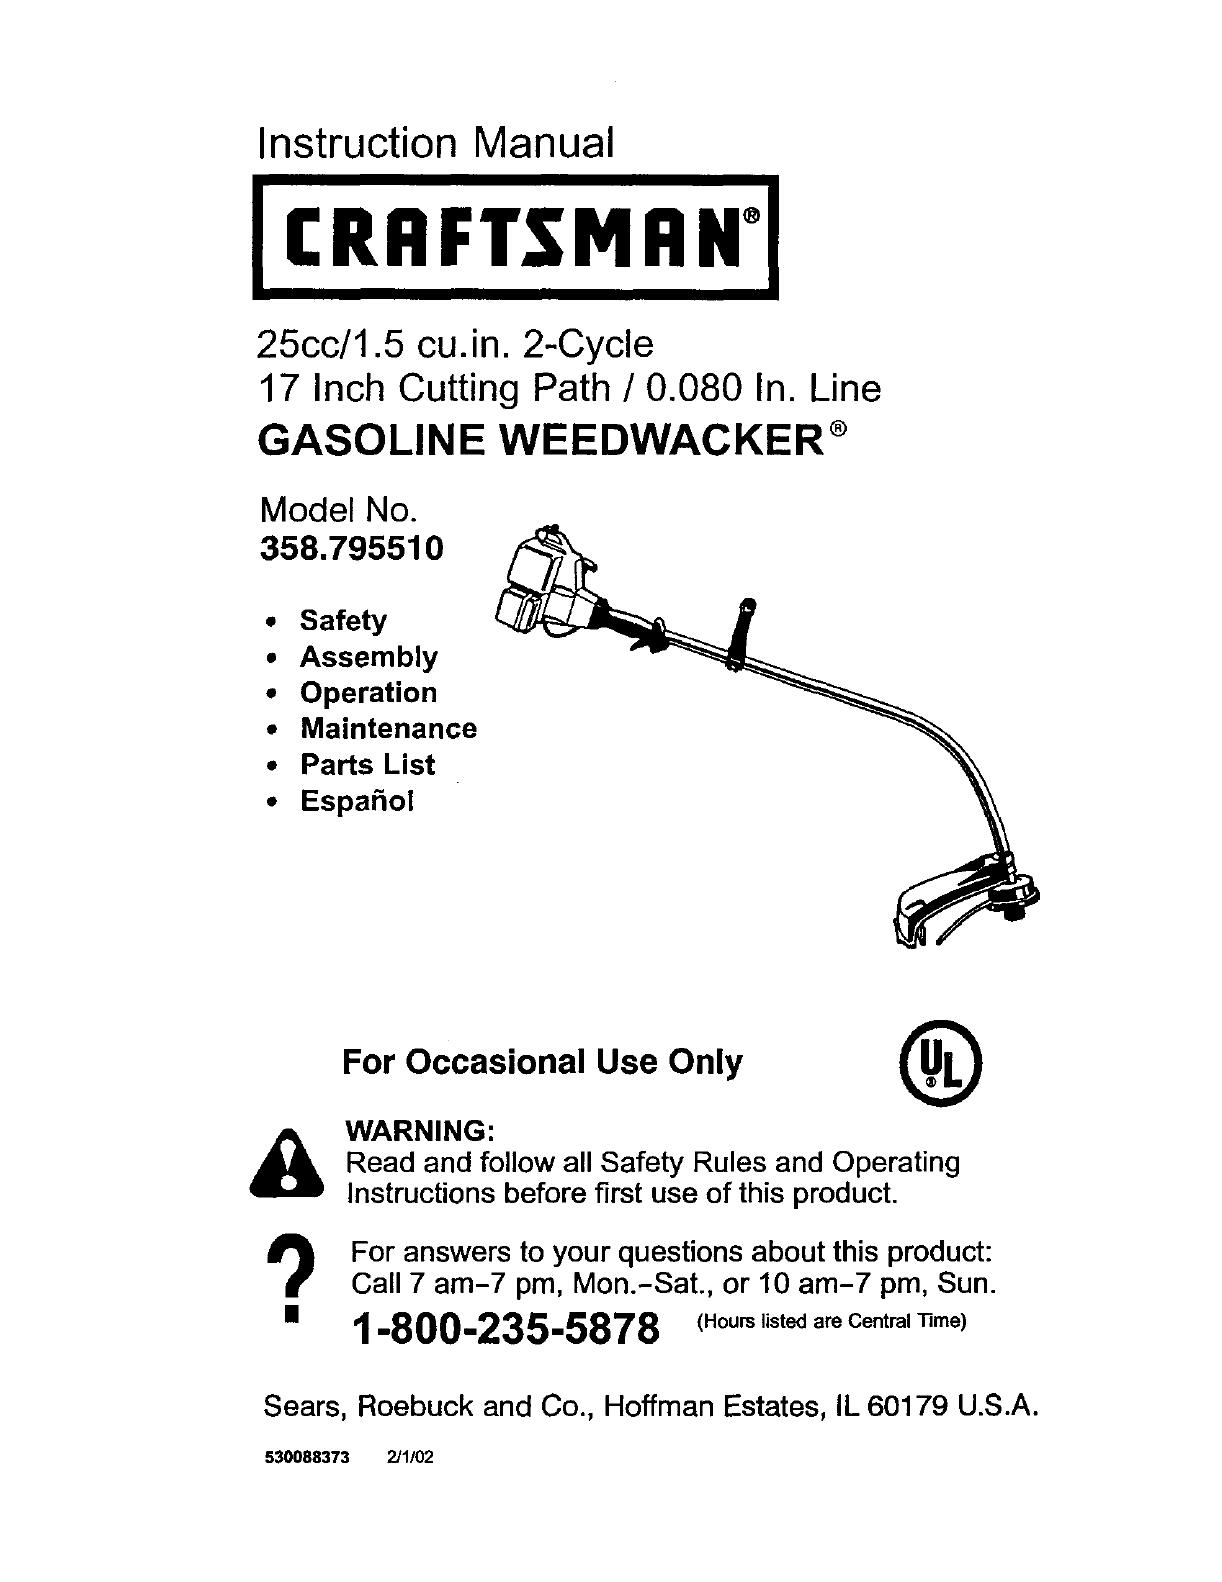 Craftsman 358795510 User Manual SEARS GAS WEEDWACKER Manuals And